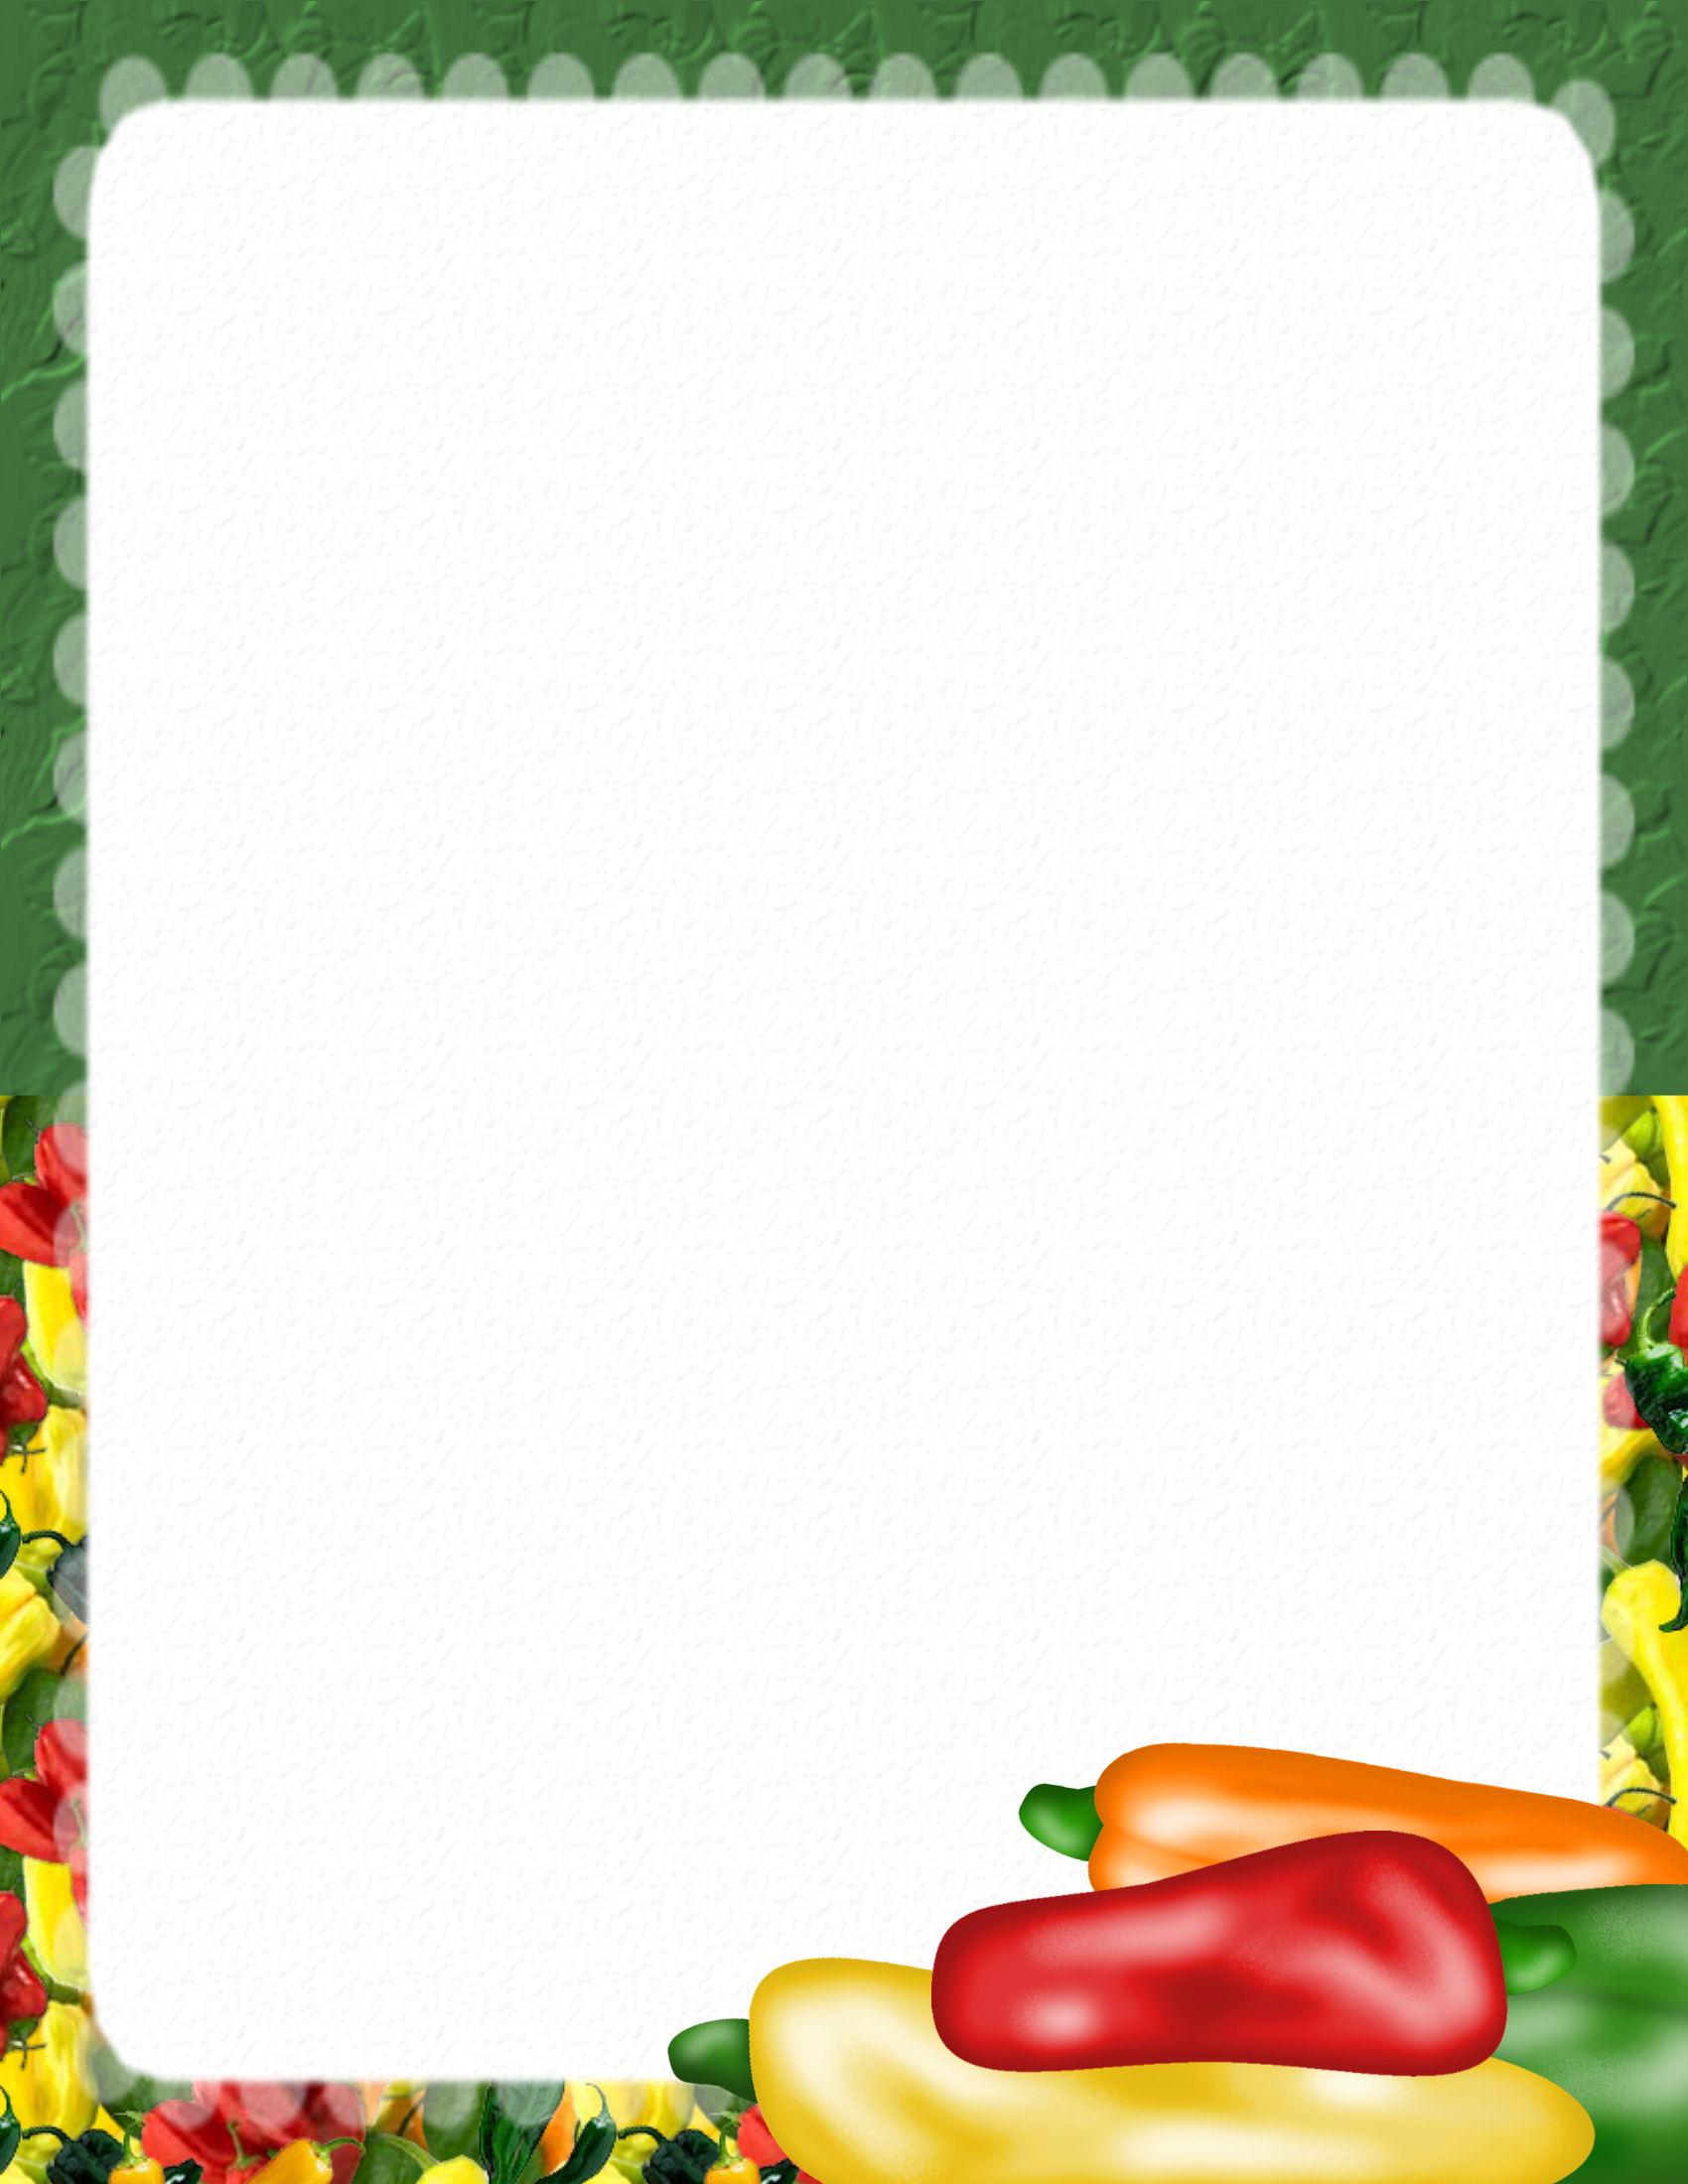 14 Food Paper Border Designs Images